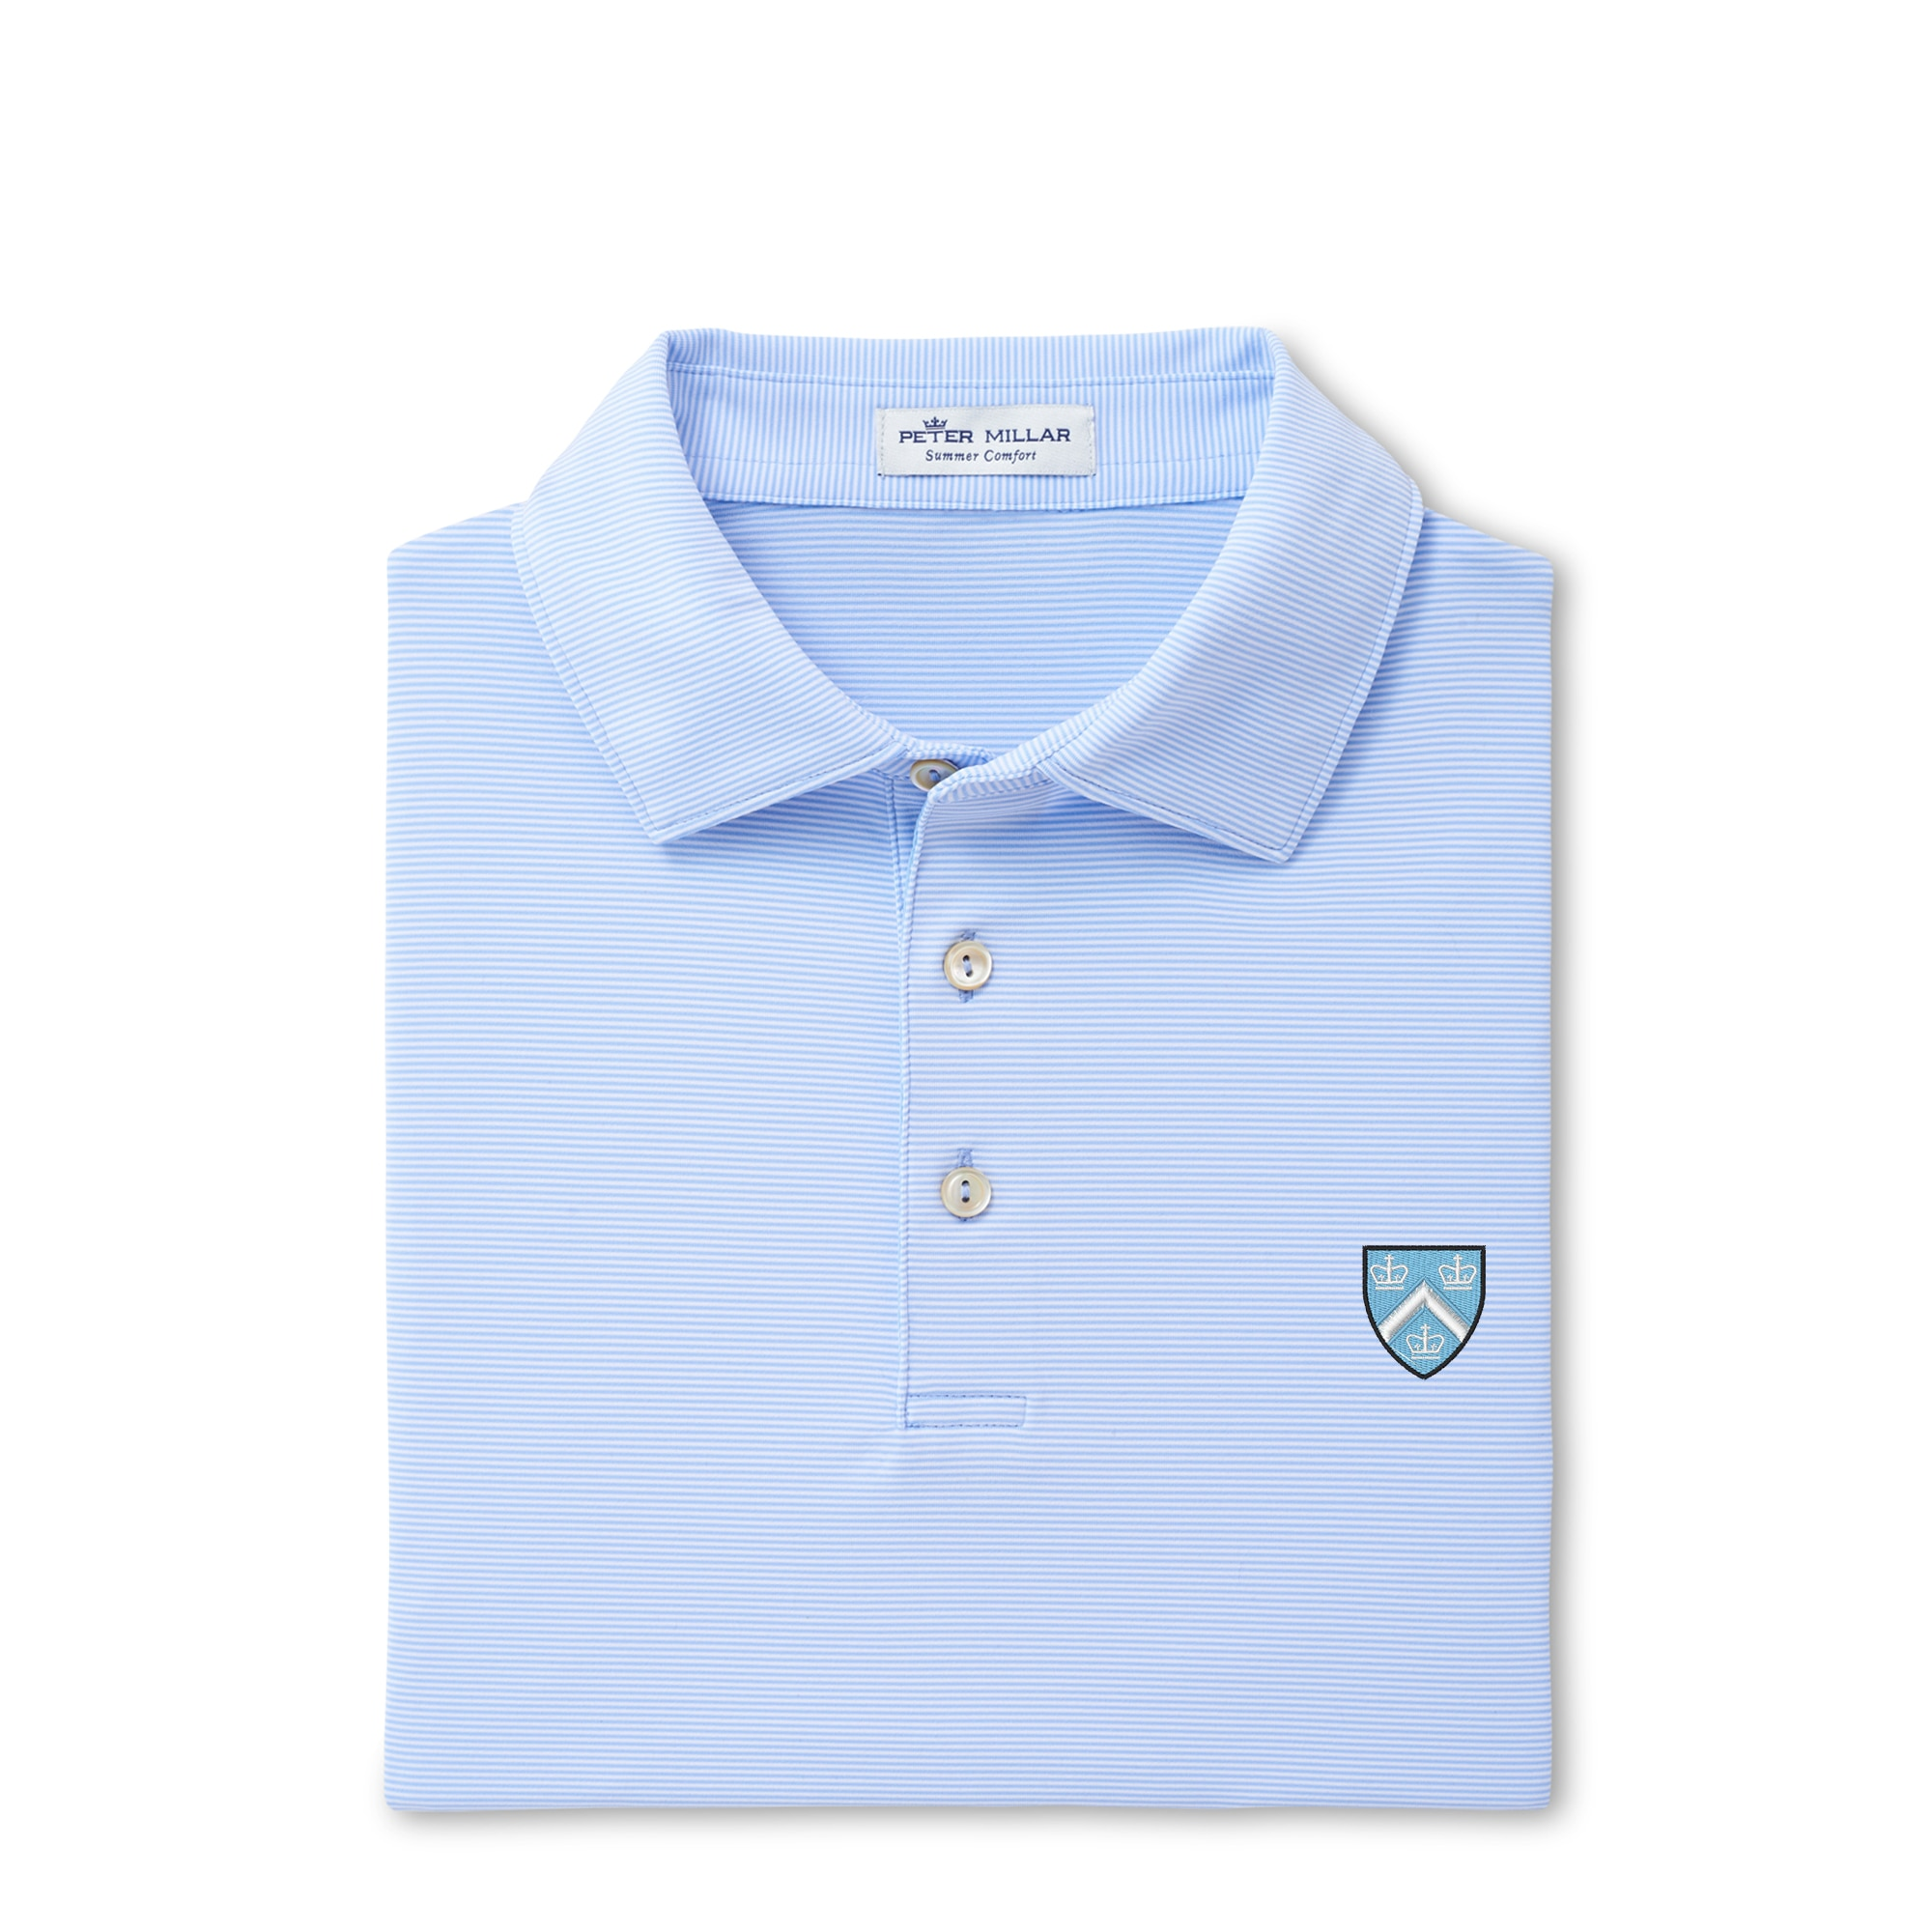 Peter Millar College Stripe Stretch Jersey Polo